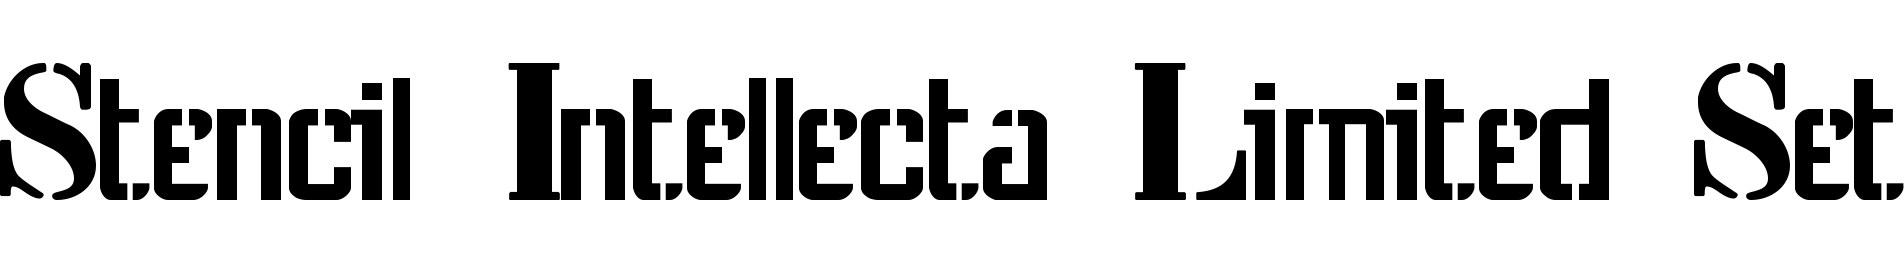 Stencil Intellecta Limited Set